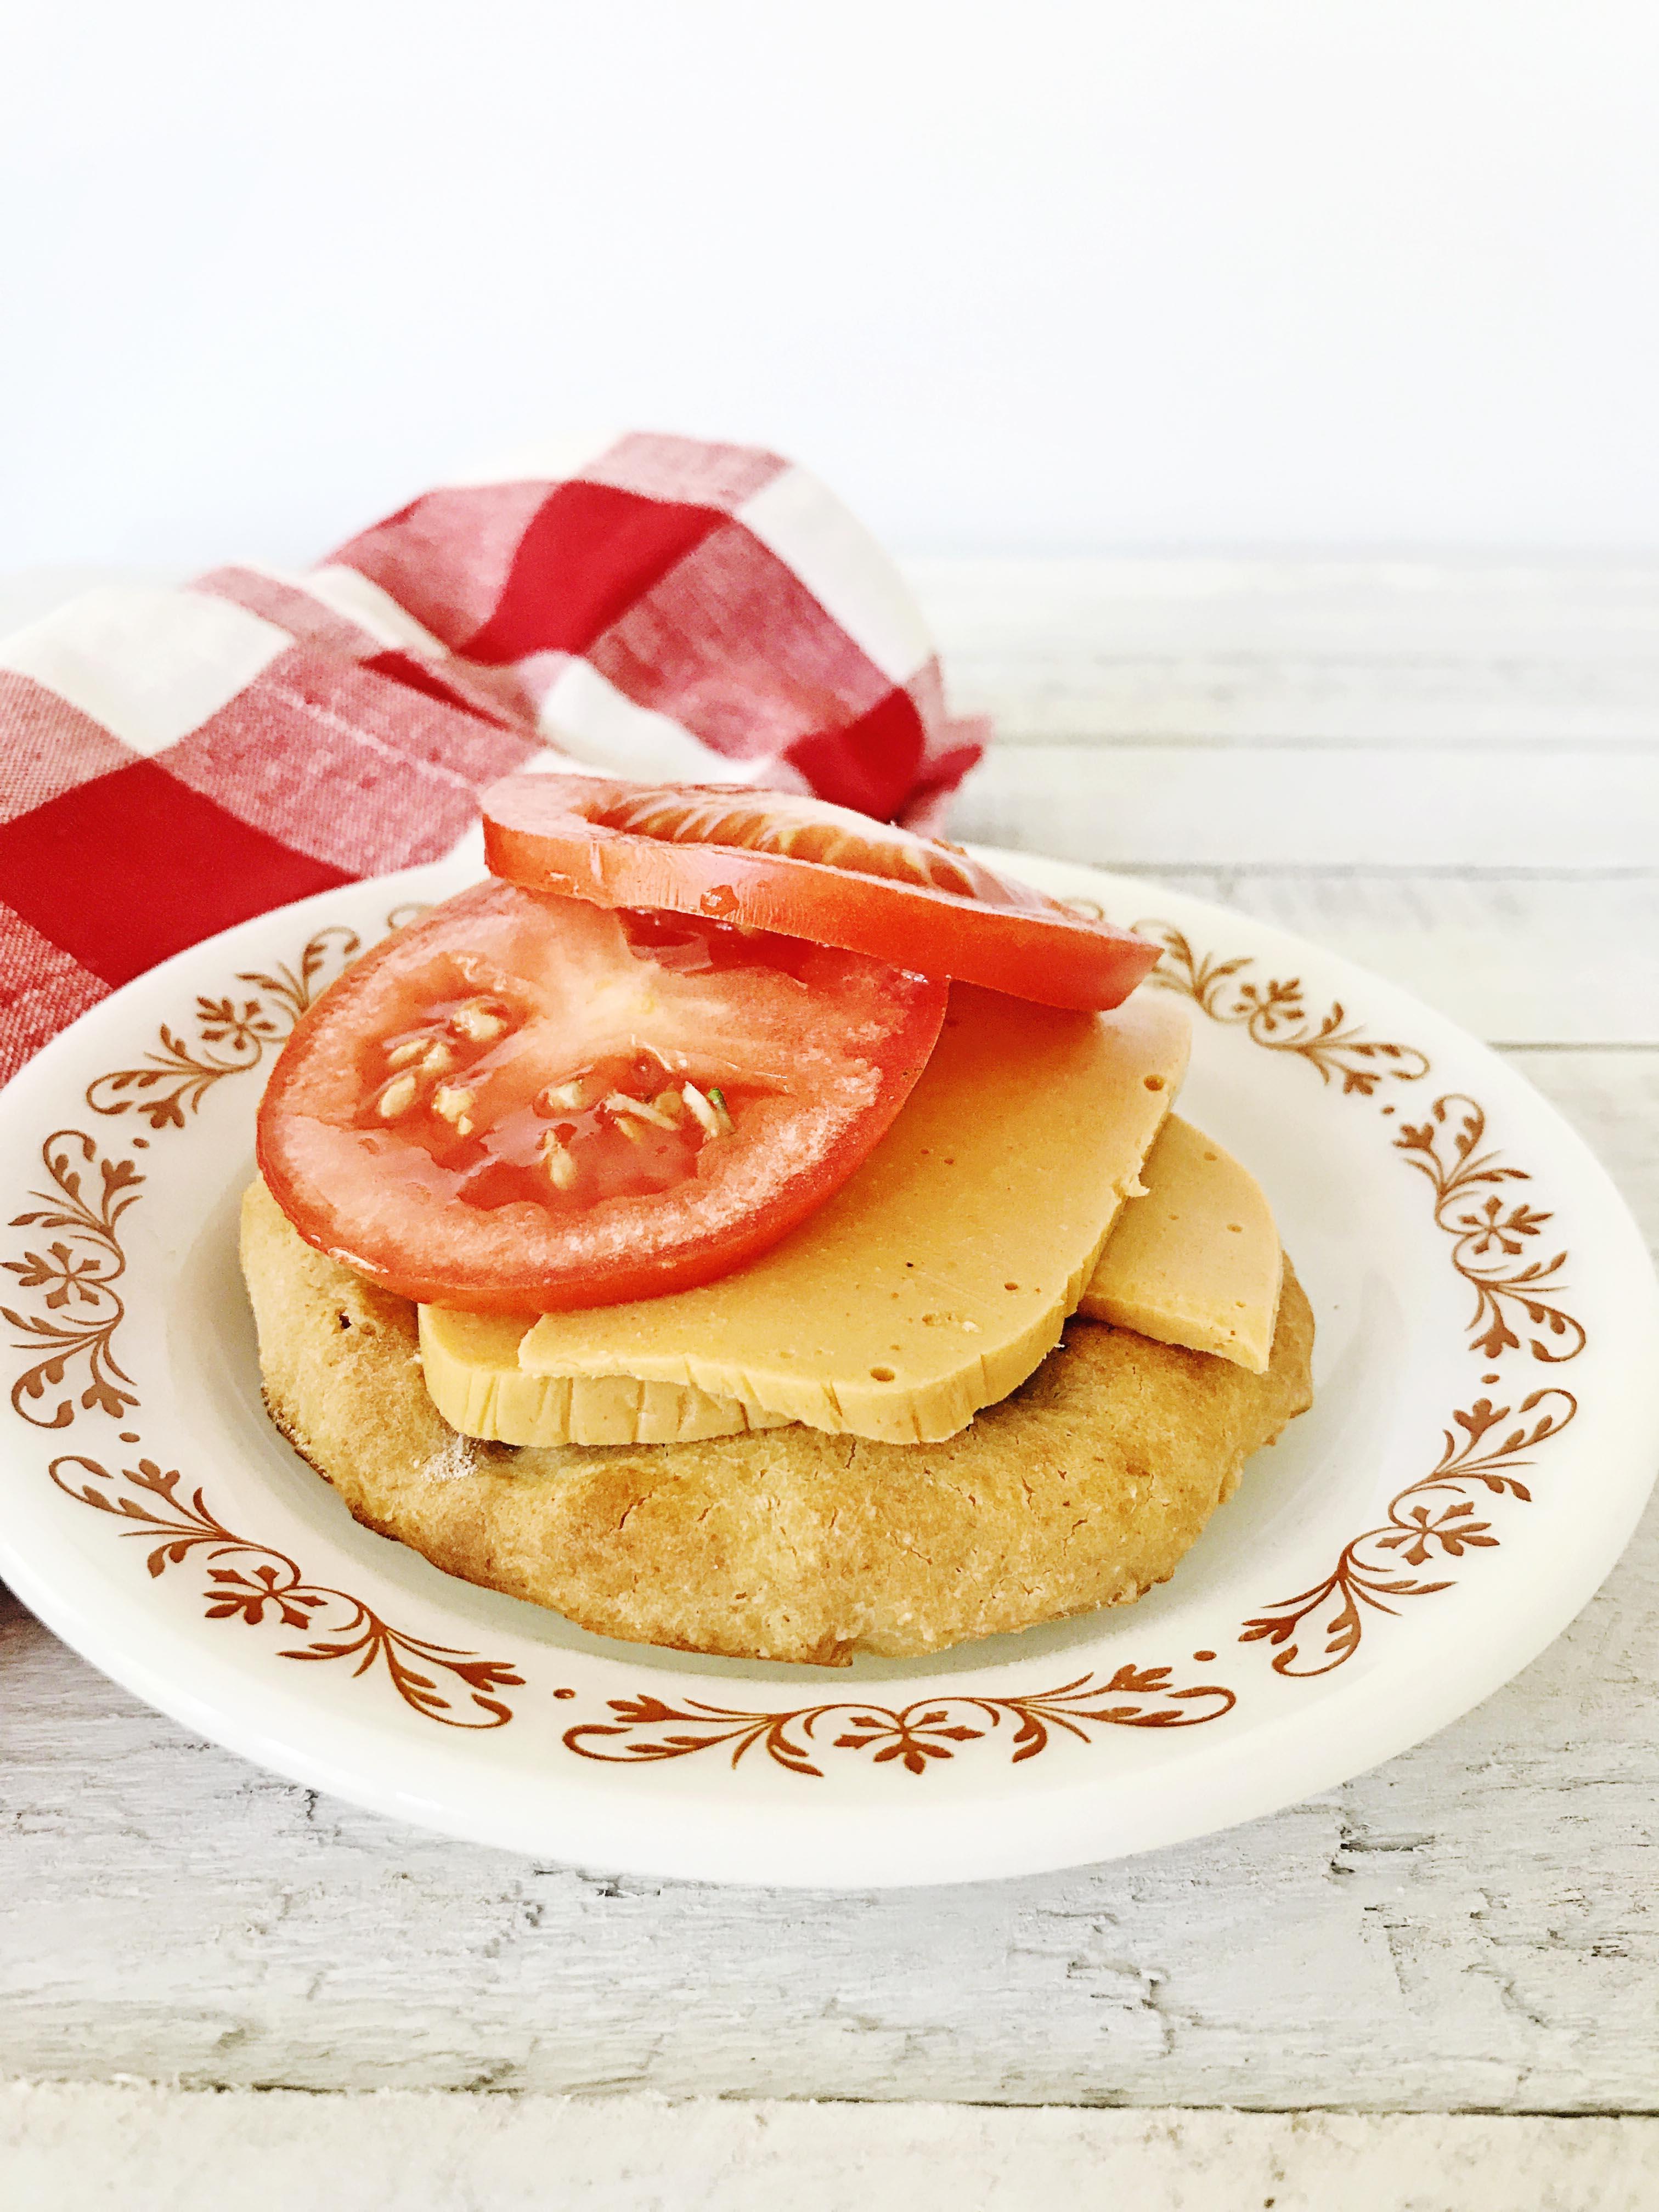 Smoky Vegan Cheese | Julie's Kitchenette